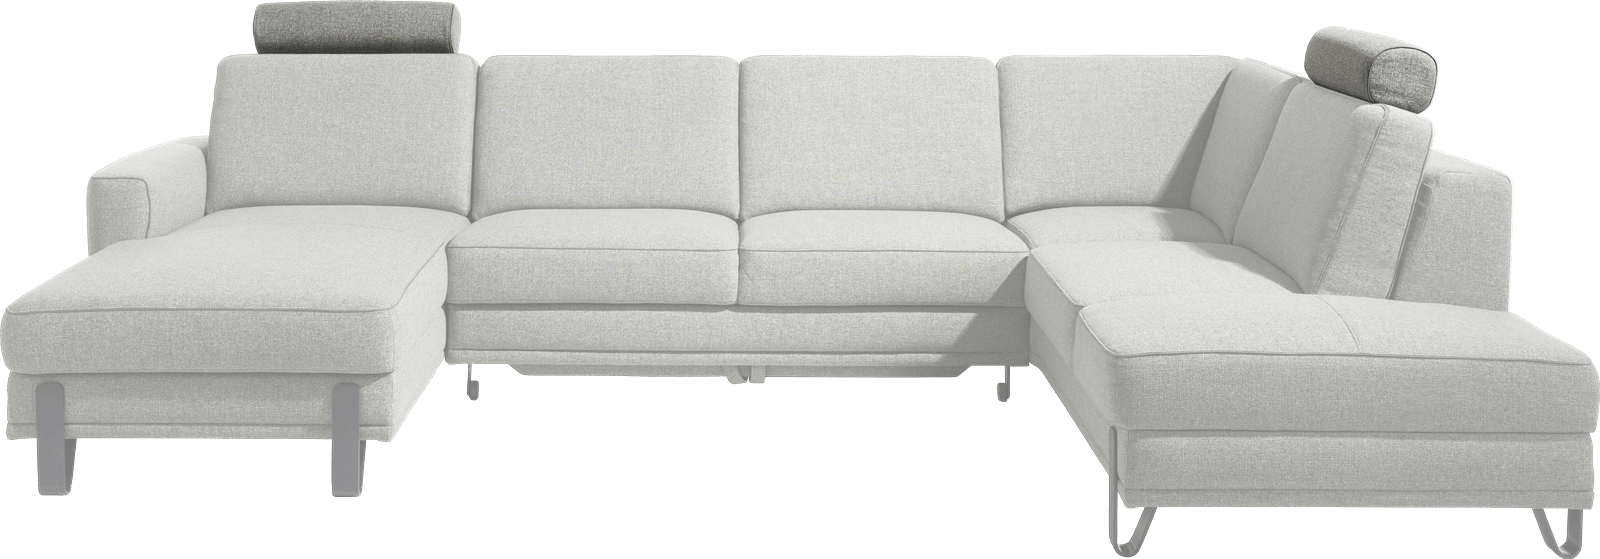 XOOON - Denver - Minimalistisch design - hoofdsteun